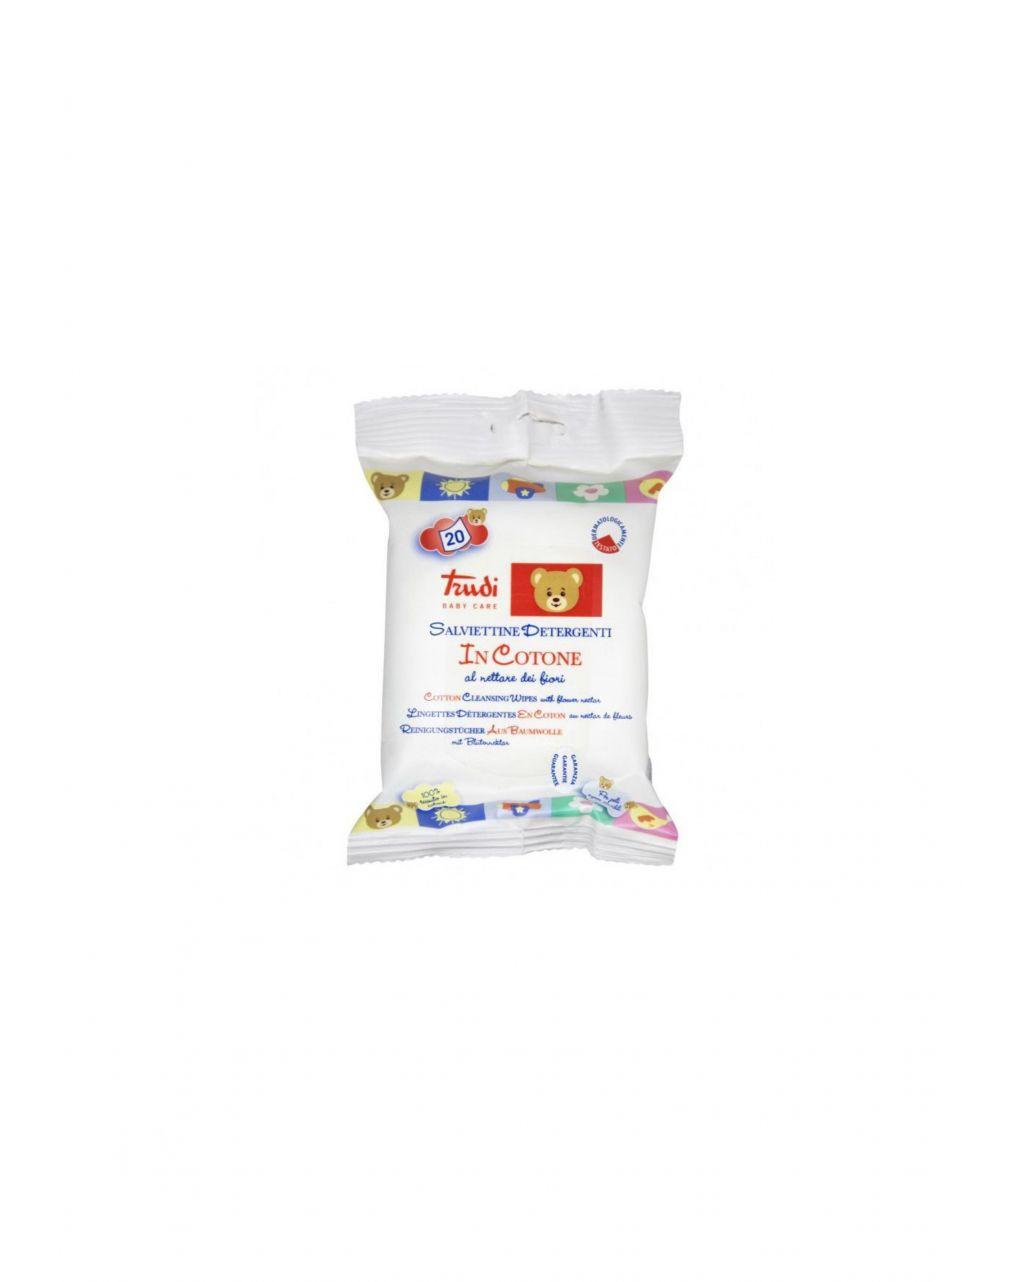 Salviettine detergenti in cotone nettare di fiori 20 pz - Trudi